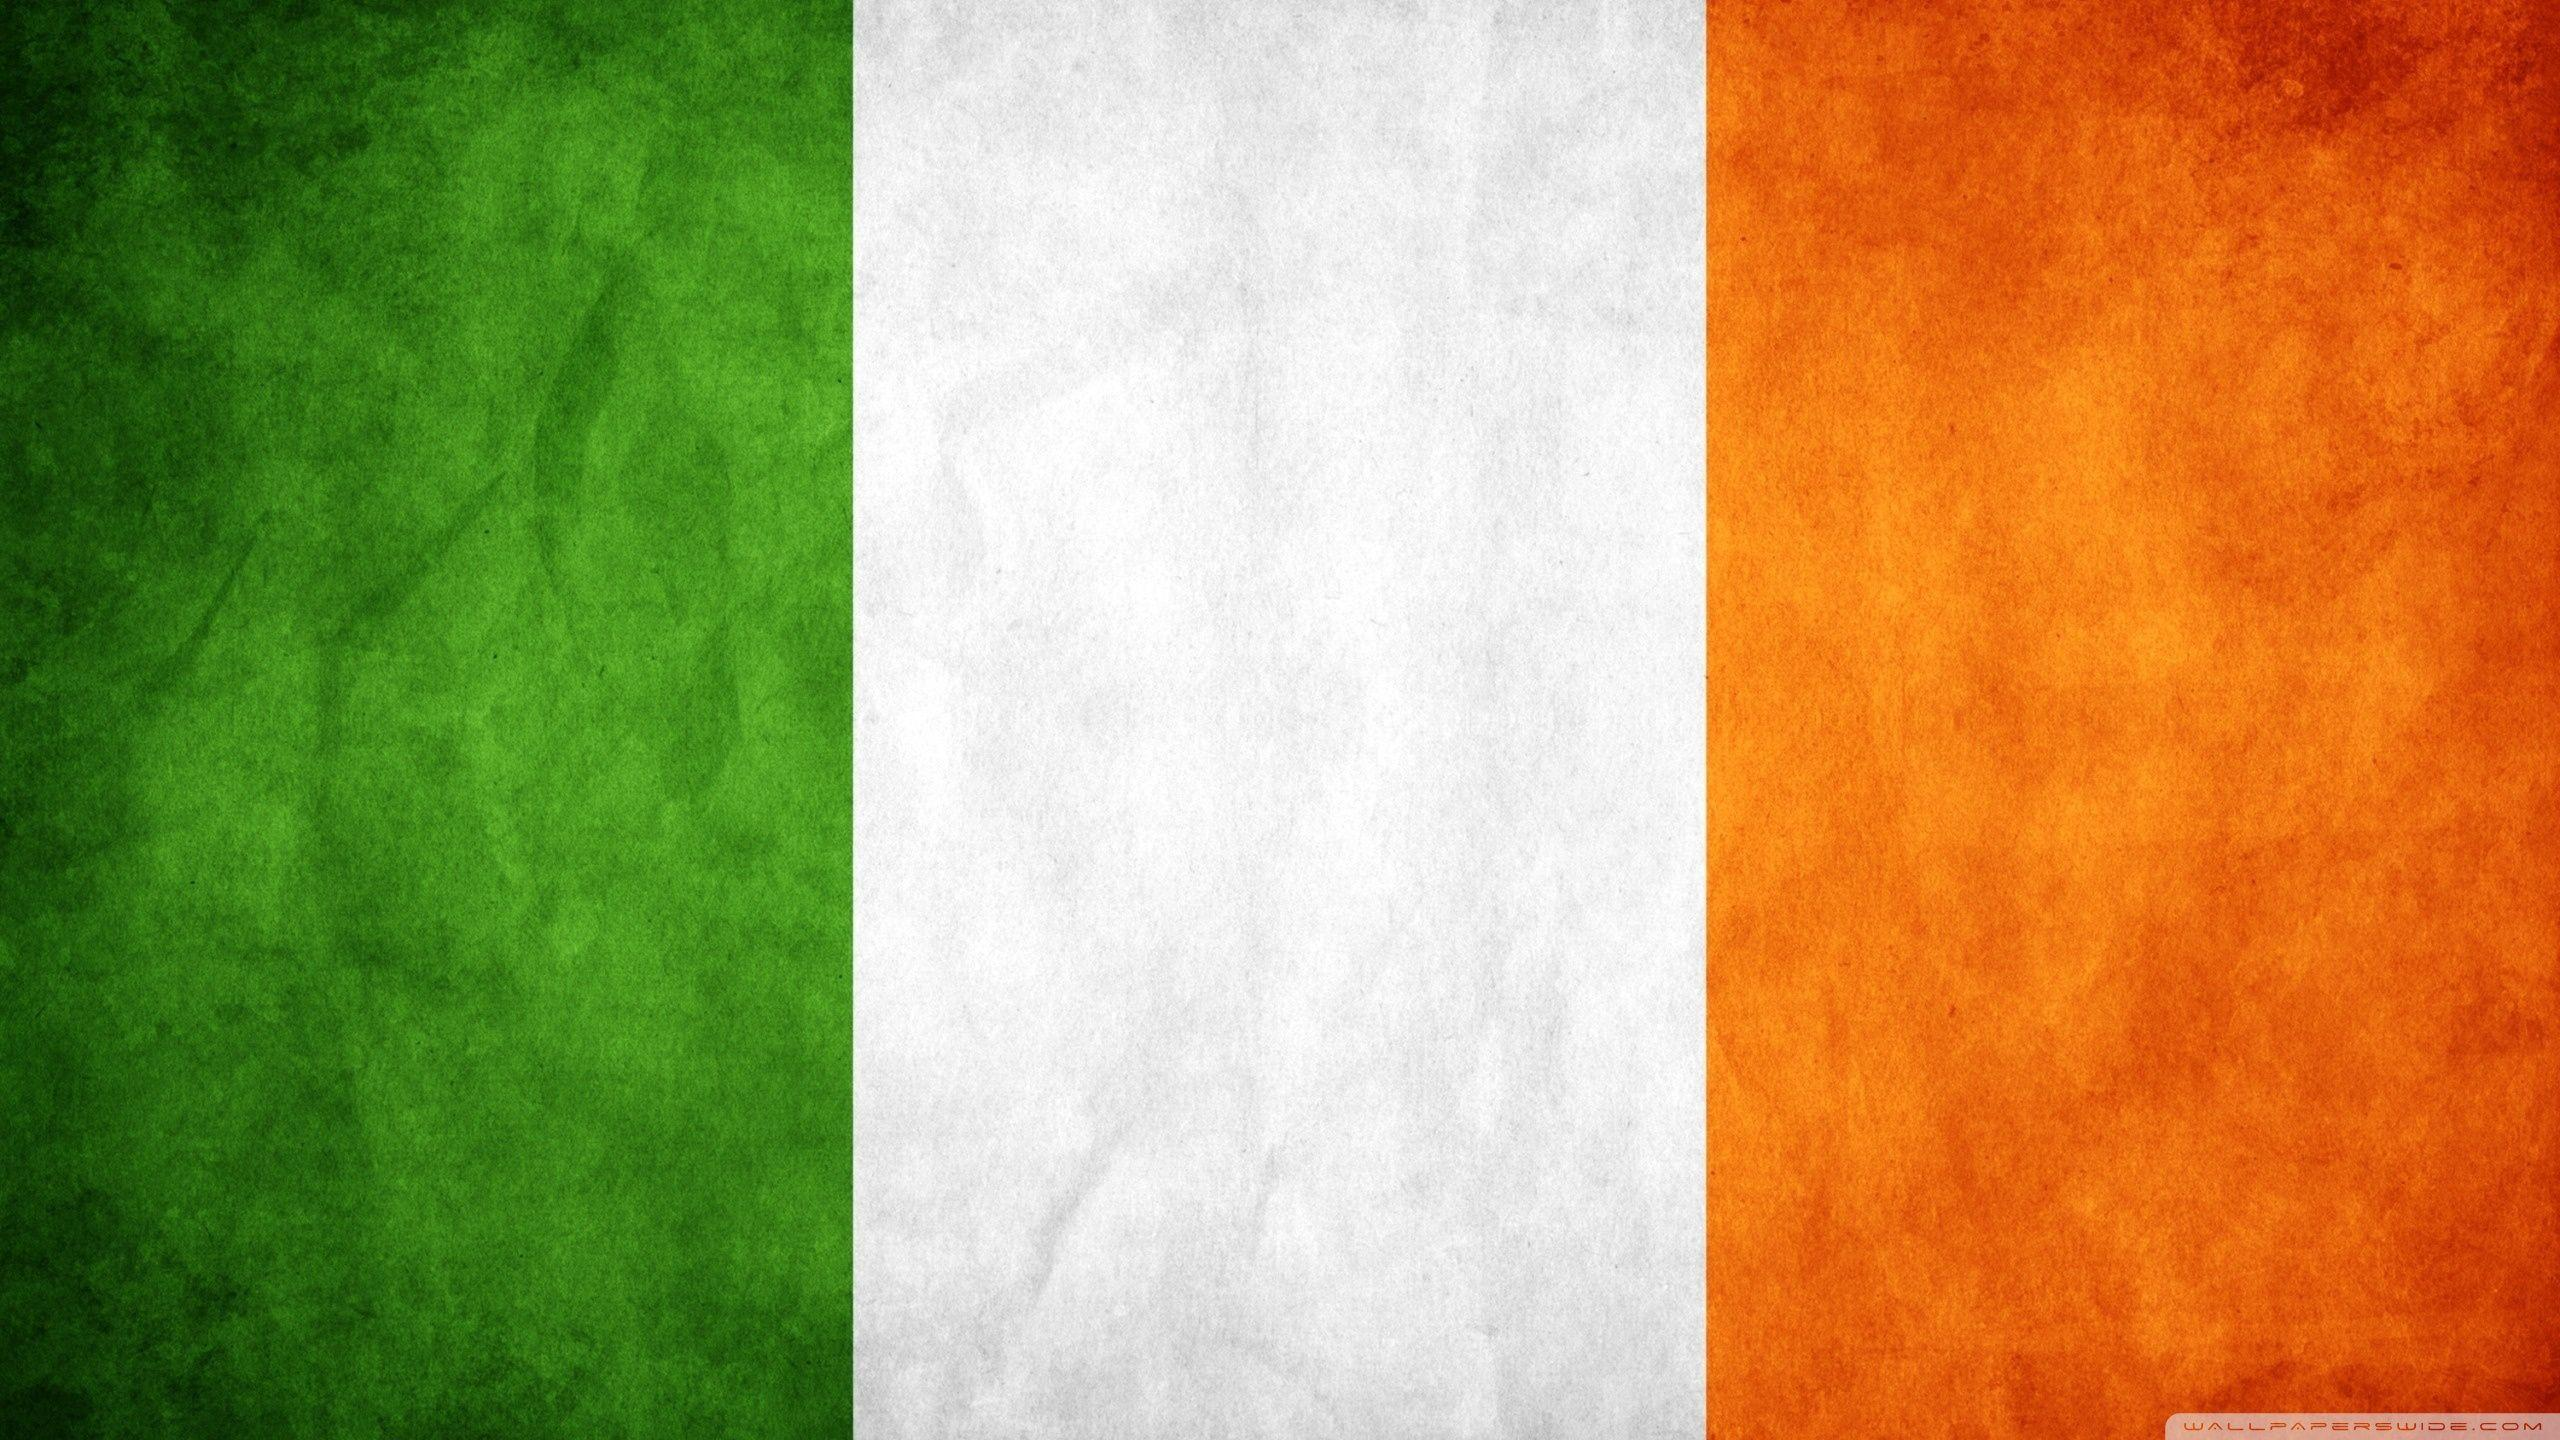 Irish Flag Wallpapers - Wallpaper Cave